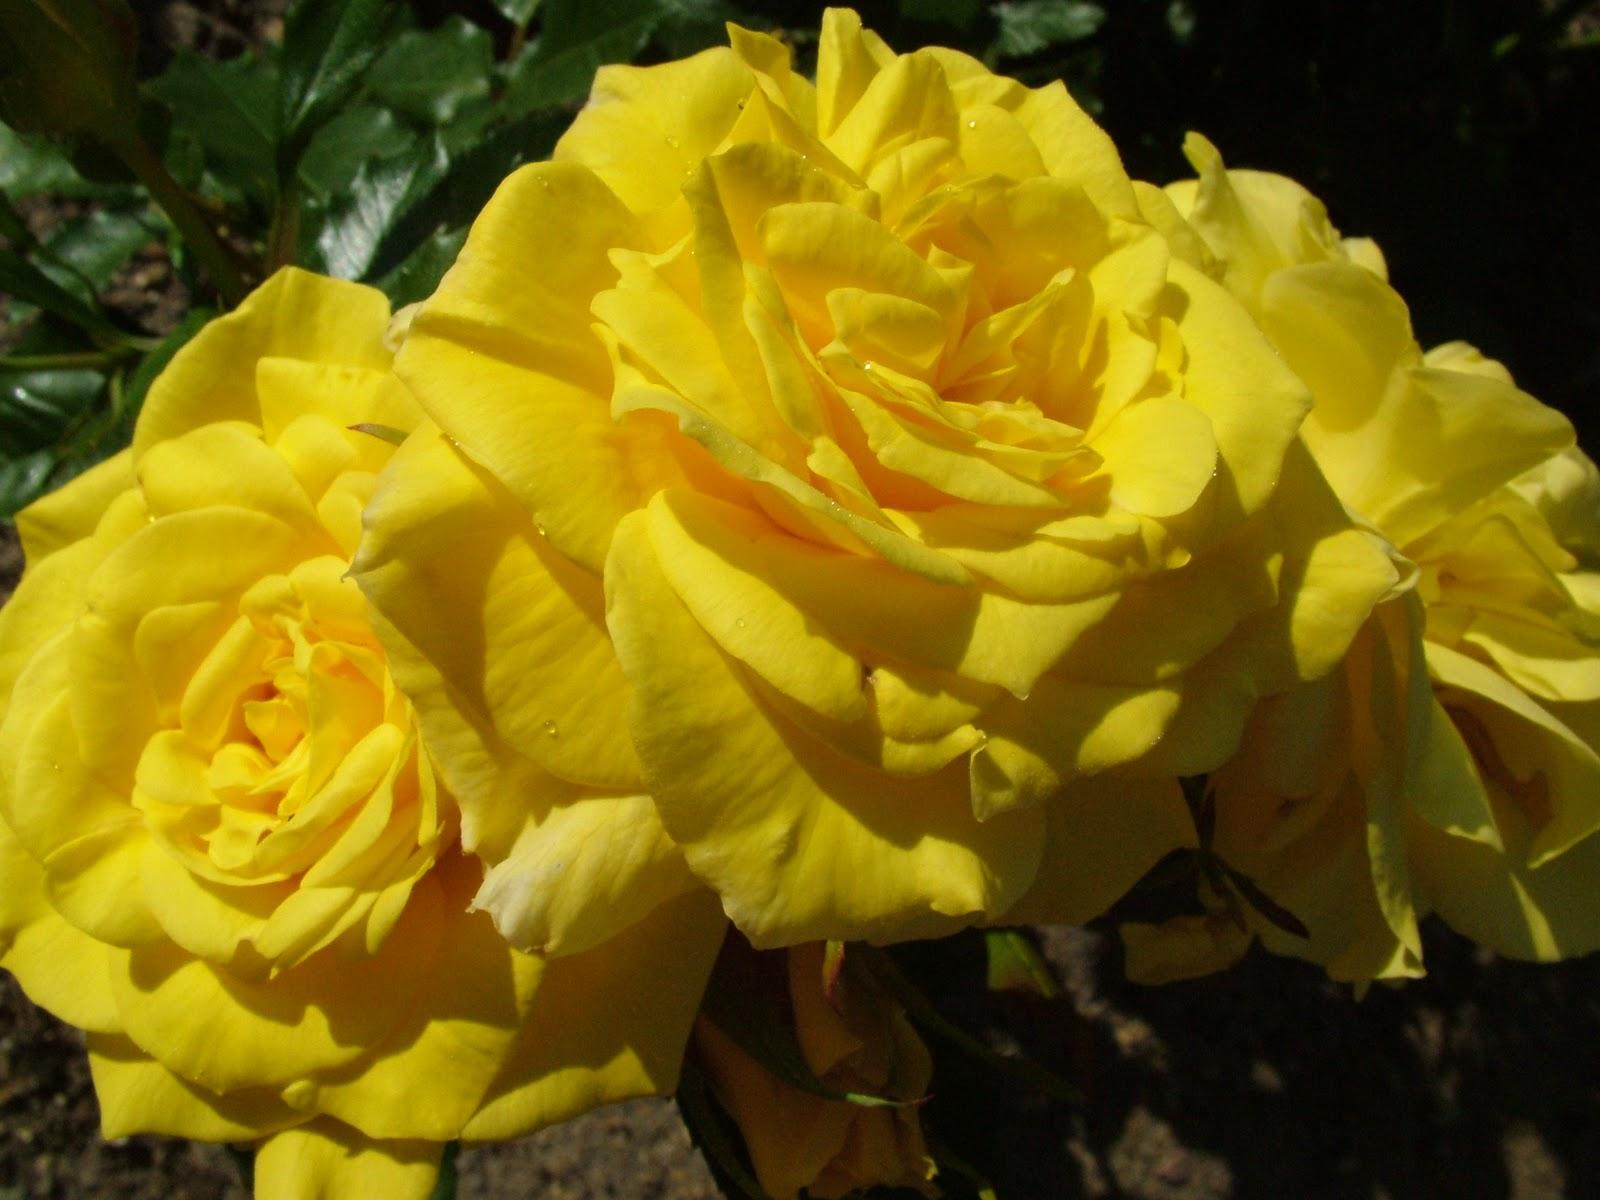 http://1.bp.blogspot.com/-4XSS2nFoaQI/TV32odmS8lI/AAAAAAAAJA4/qWt00_A_XFw/s1600/yellow+rose+flowers+wallpapers+%25287%2529.jpg